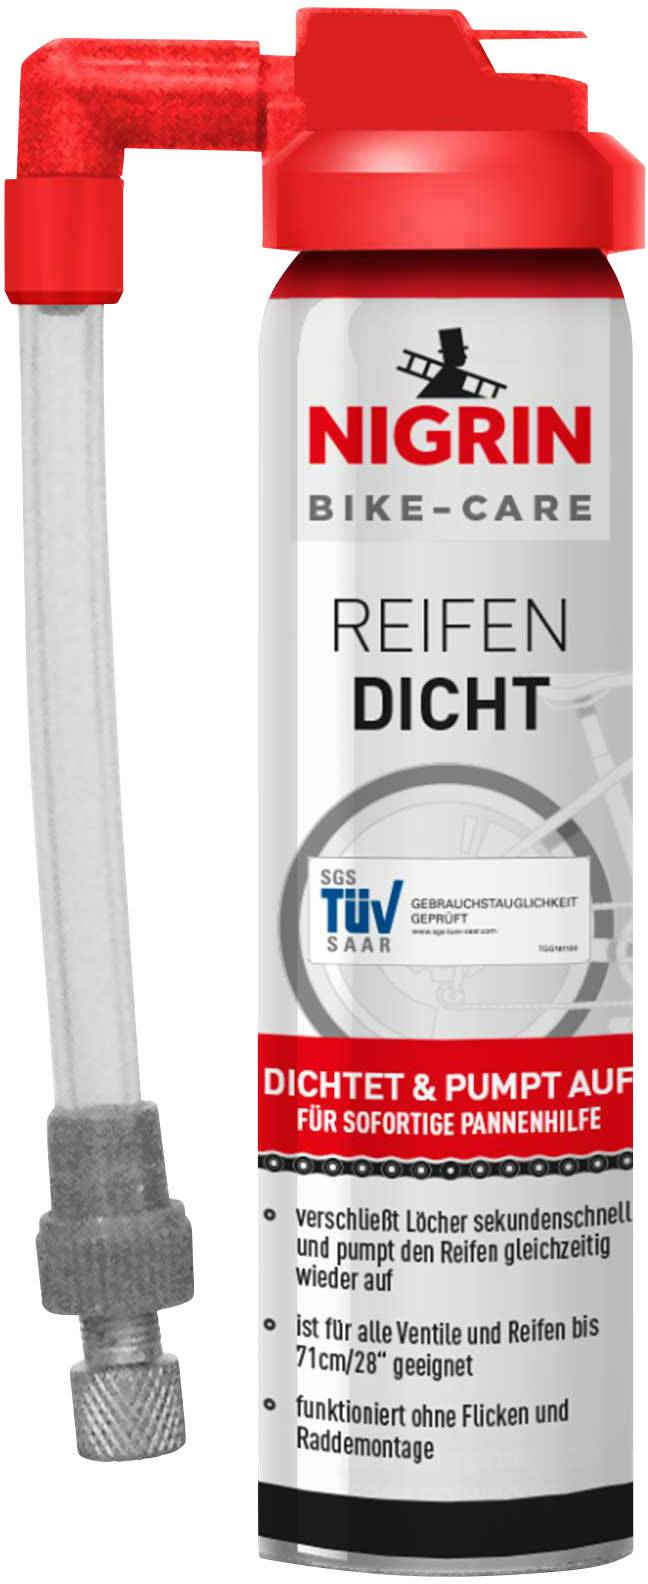 Fischer Fahrrad 85165 Fahrradschlauch 27.5 Zoll